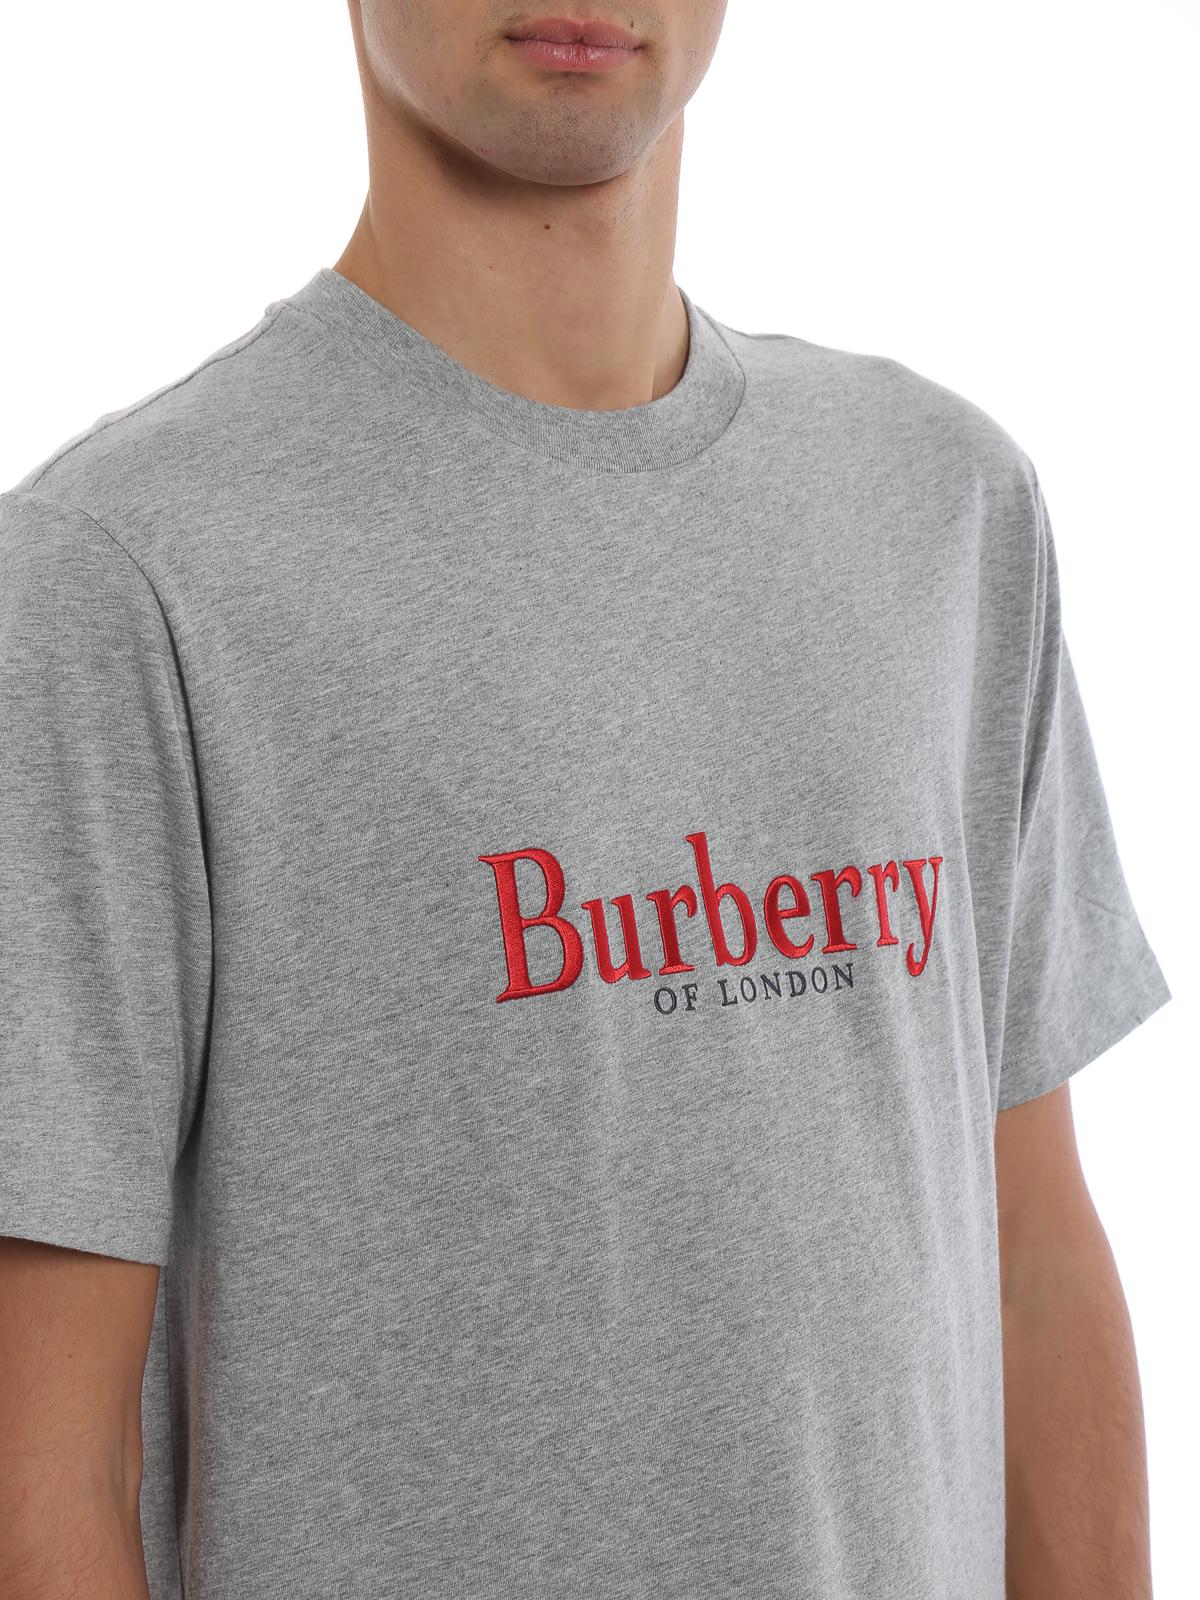 e3864e2b5a Burberry Embroidered Archive Logo Cotton T-shirt